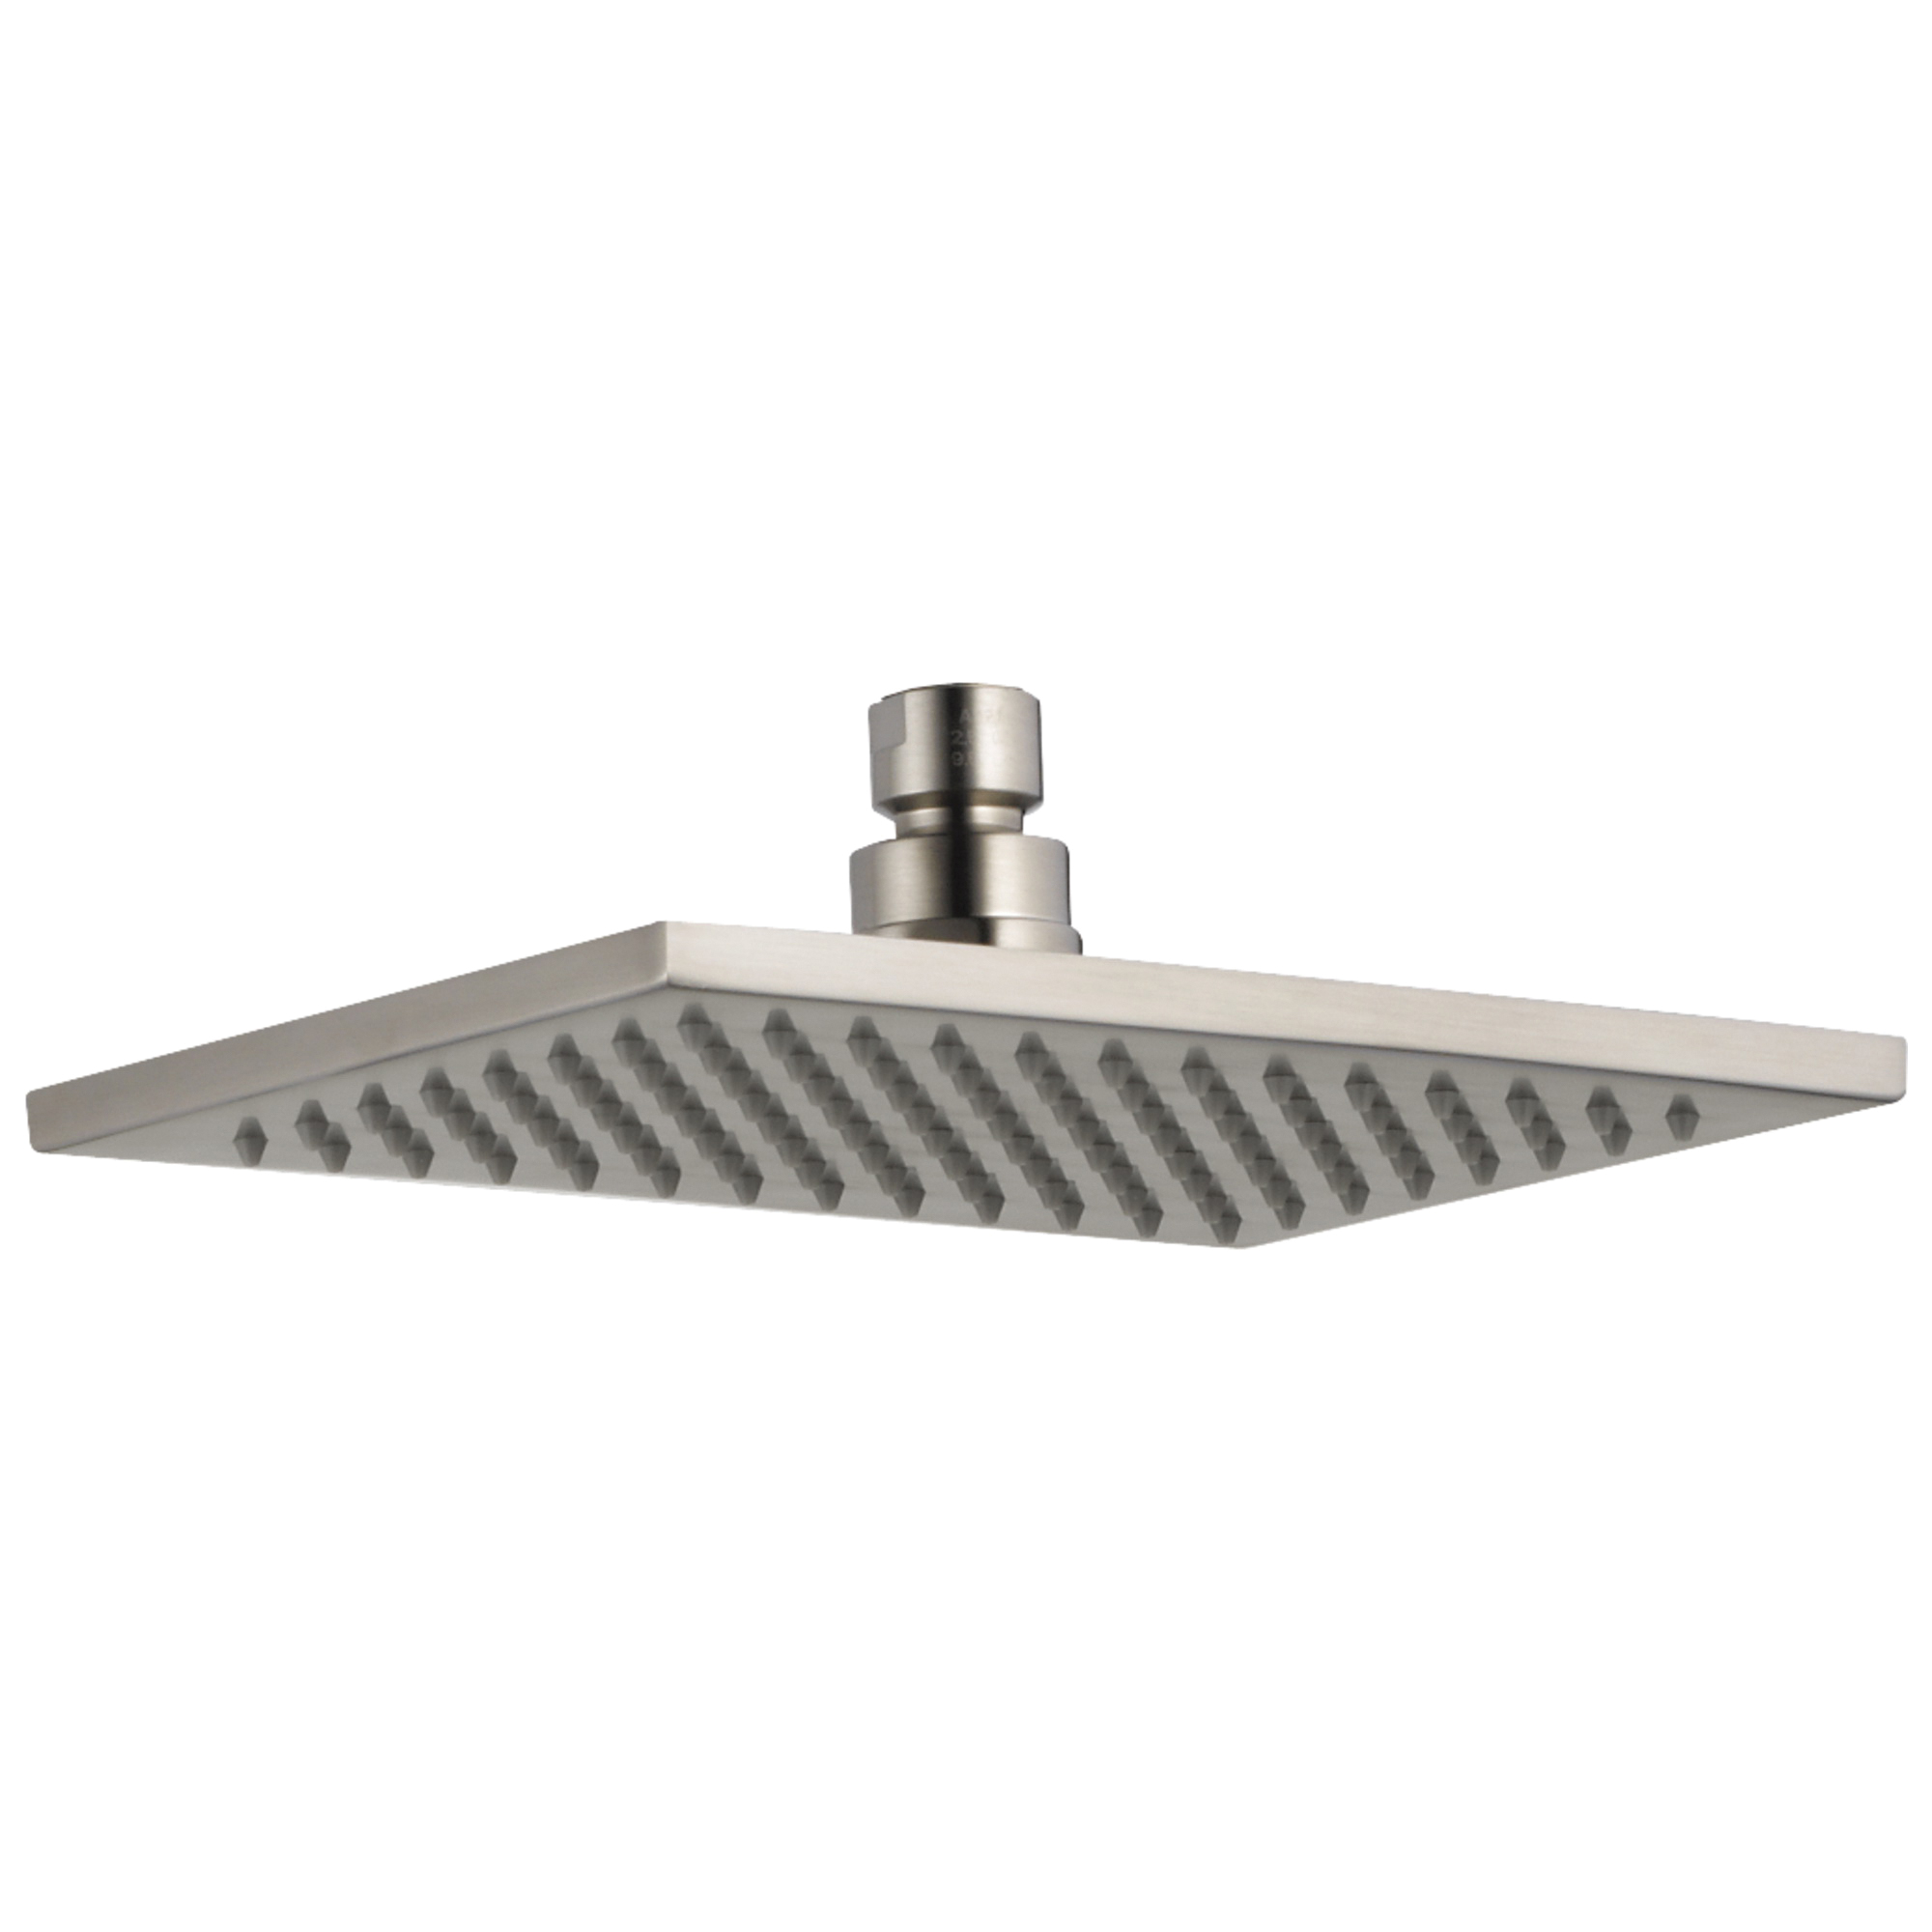 DELTA® RP91363SS Shower Head, Vero®, 2 gpm Maximum, Import